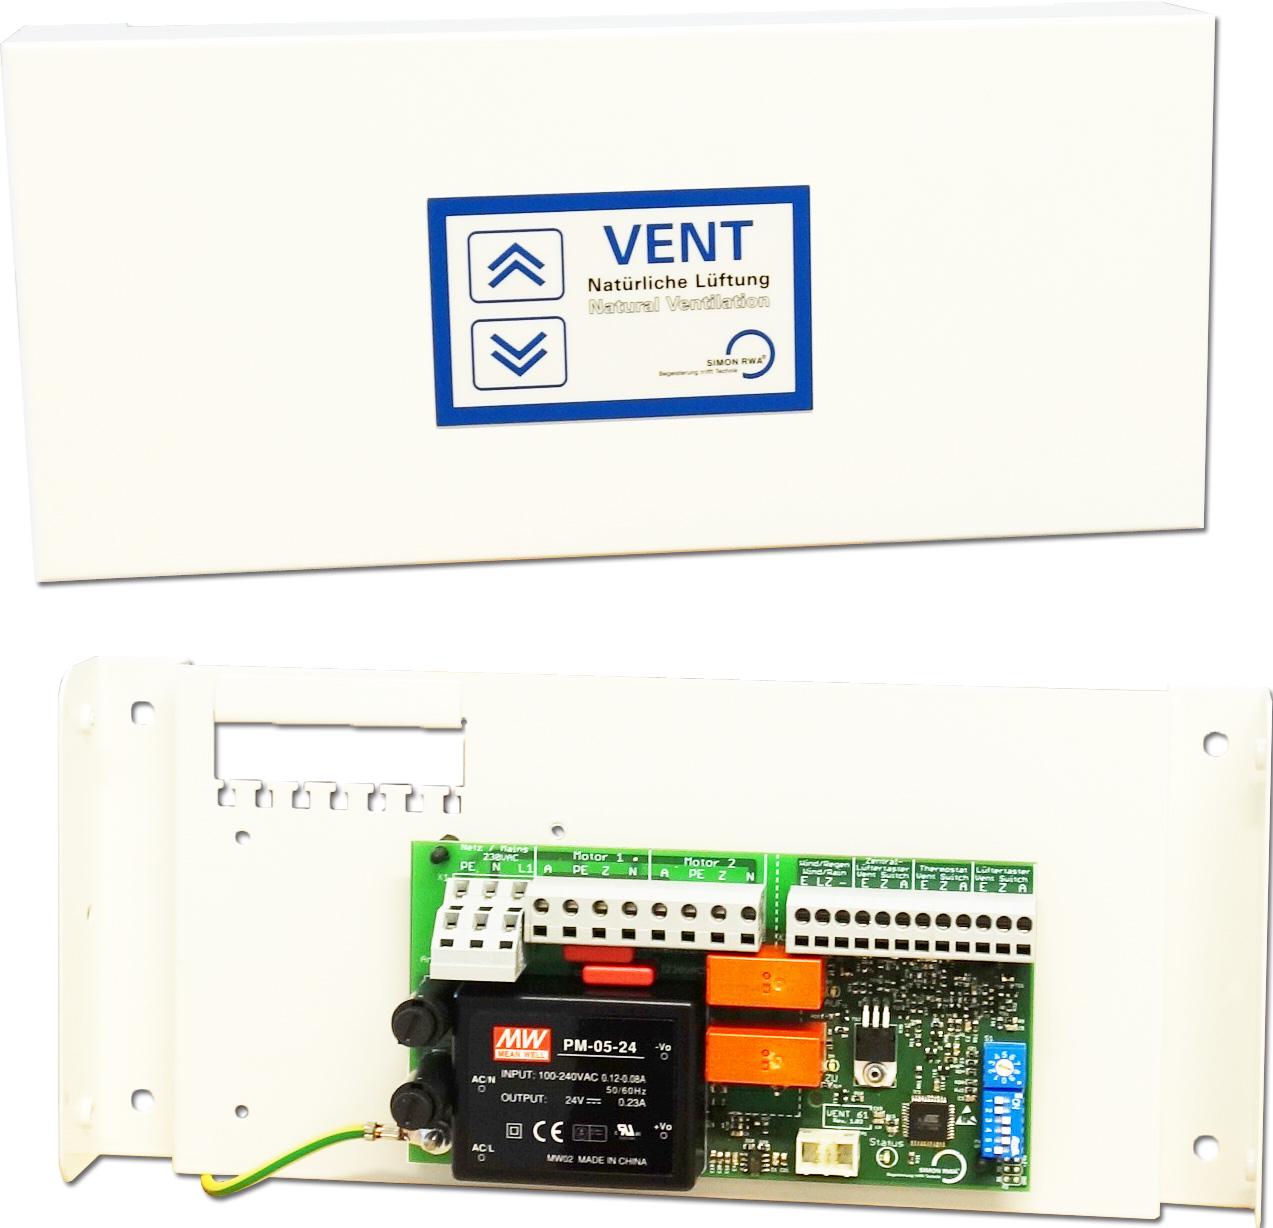 Kompaktzentrale VENT-61-AP